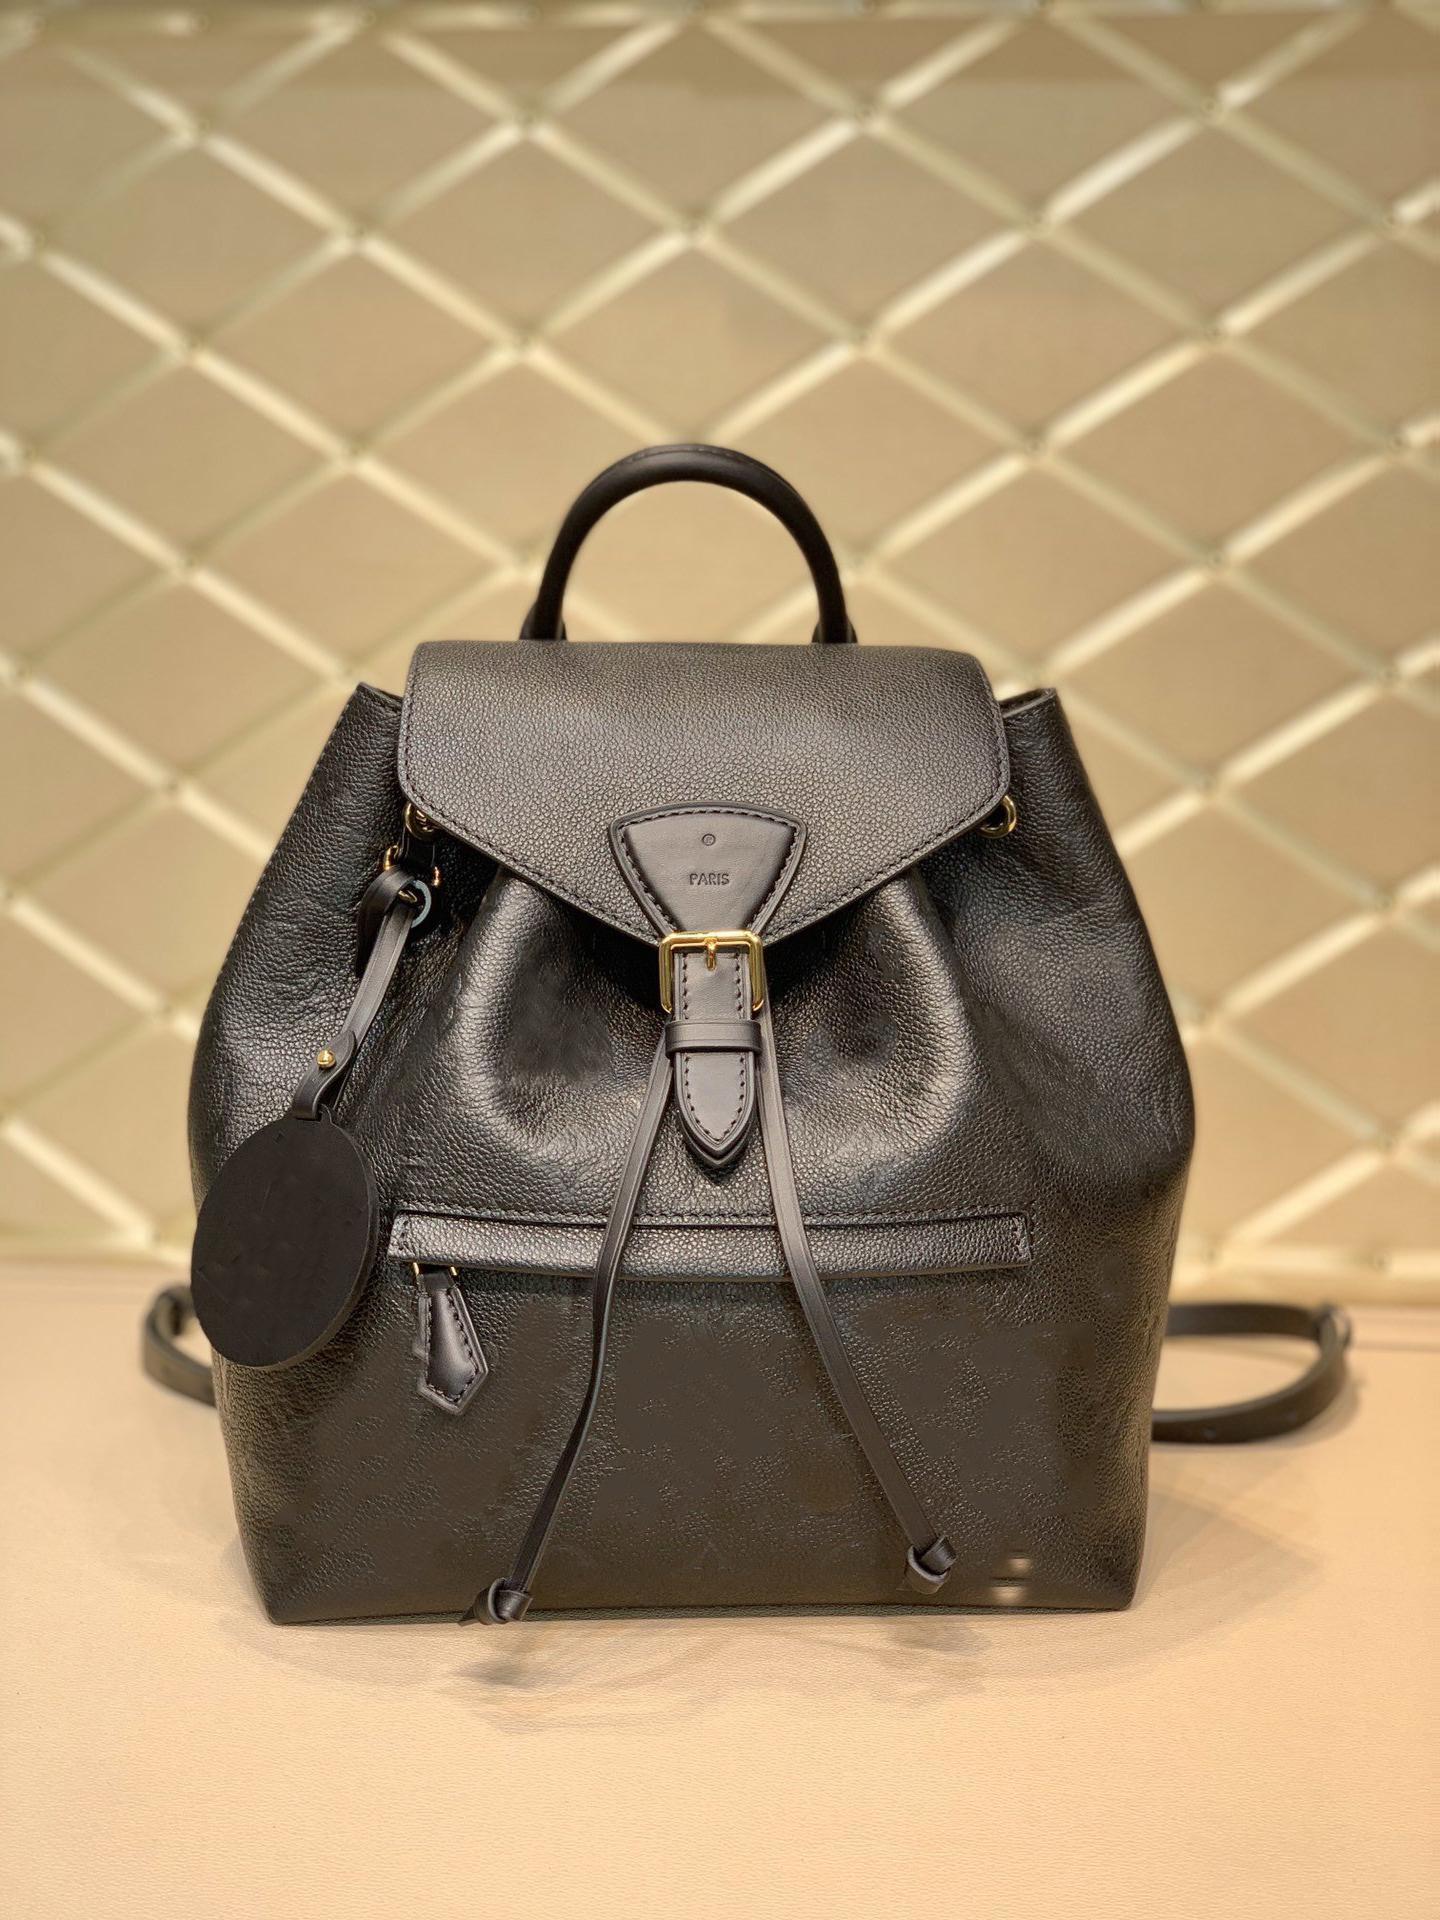 MONTSOURIS Empreinte Backpack Mens Womens Backpacks Flower Letter Leather Pattern Embossed Montsouris Purses Bags M45205 M45410 M45397